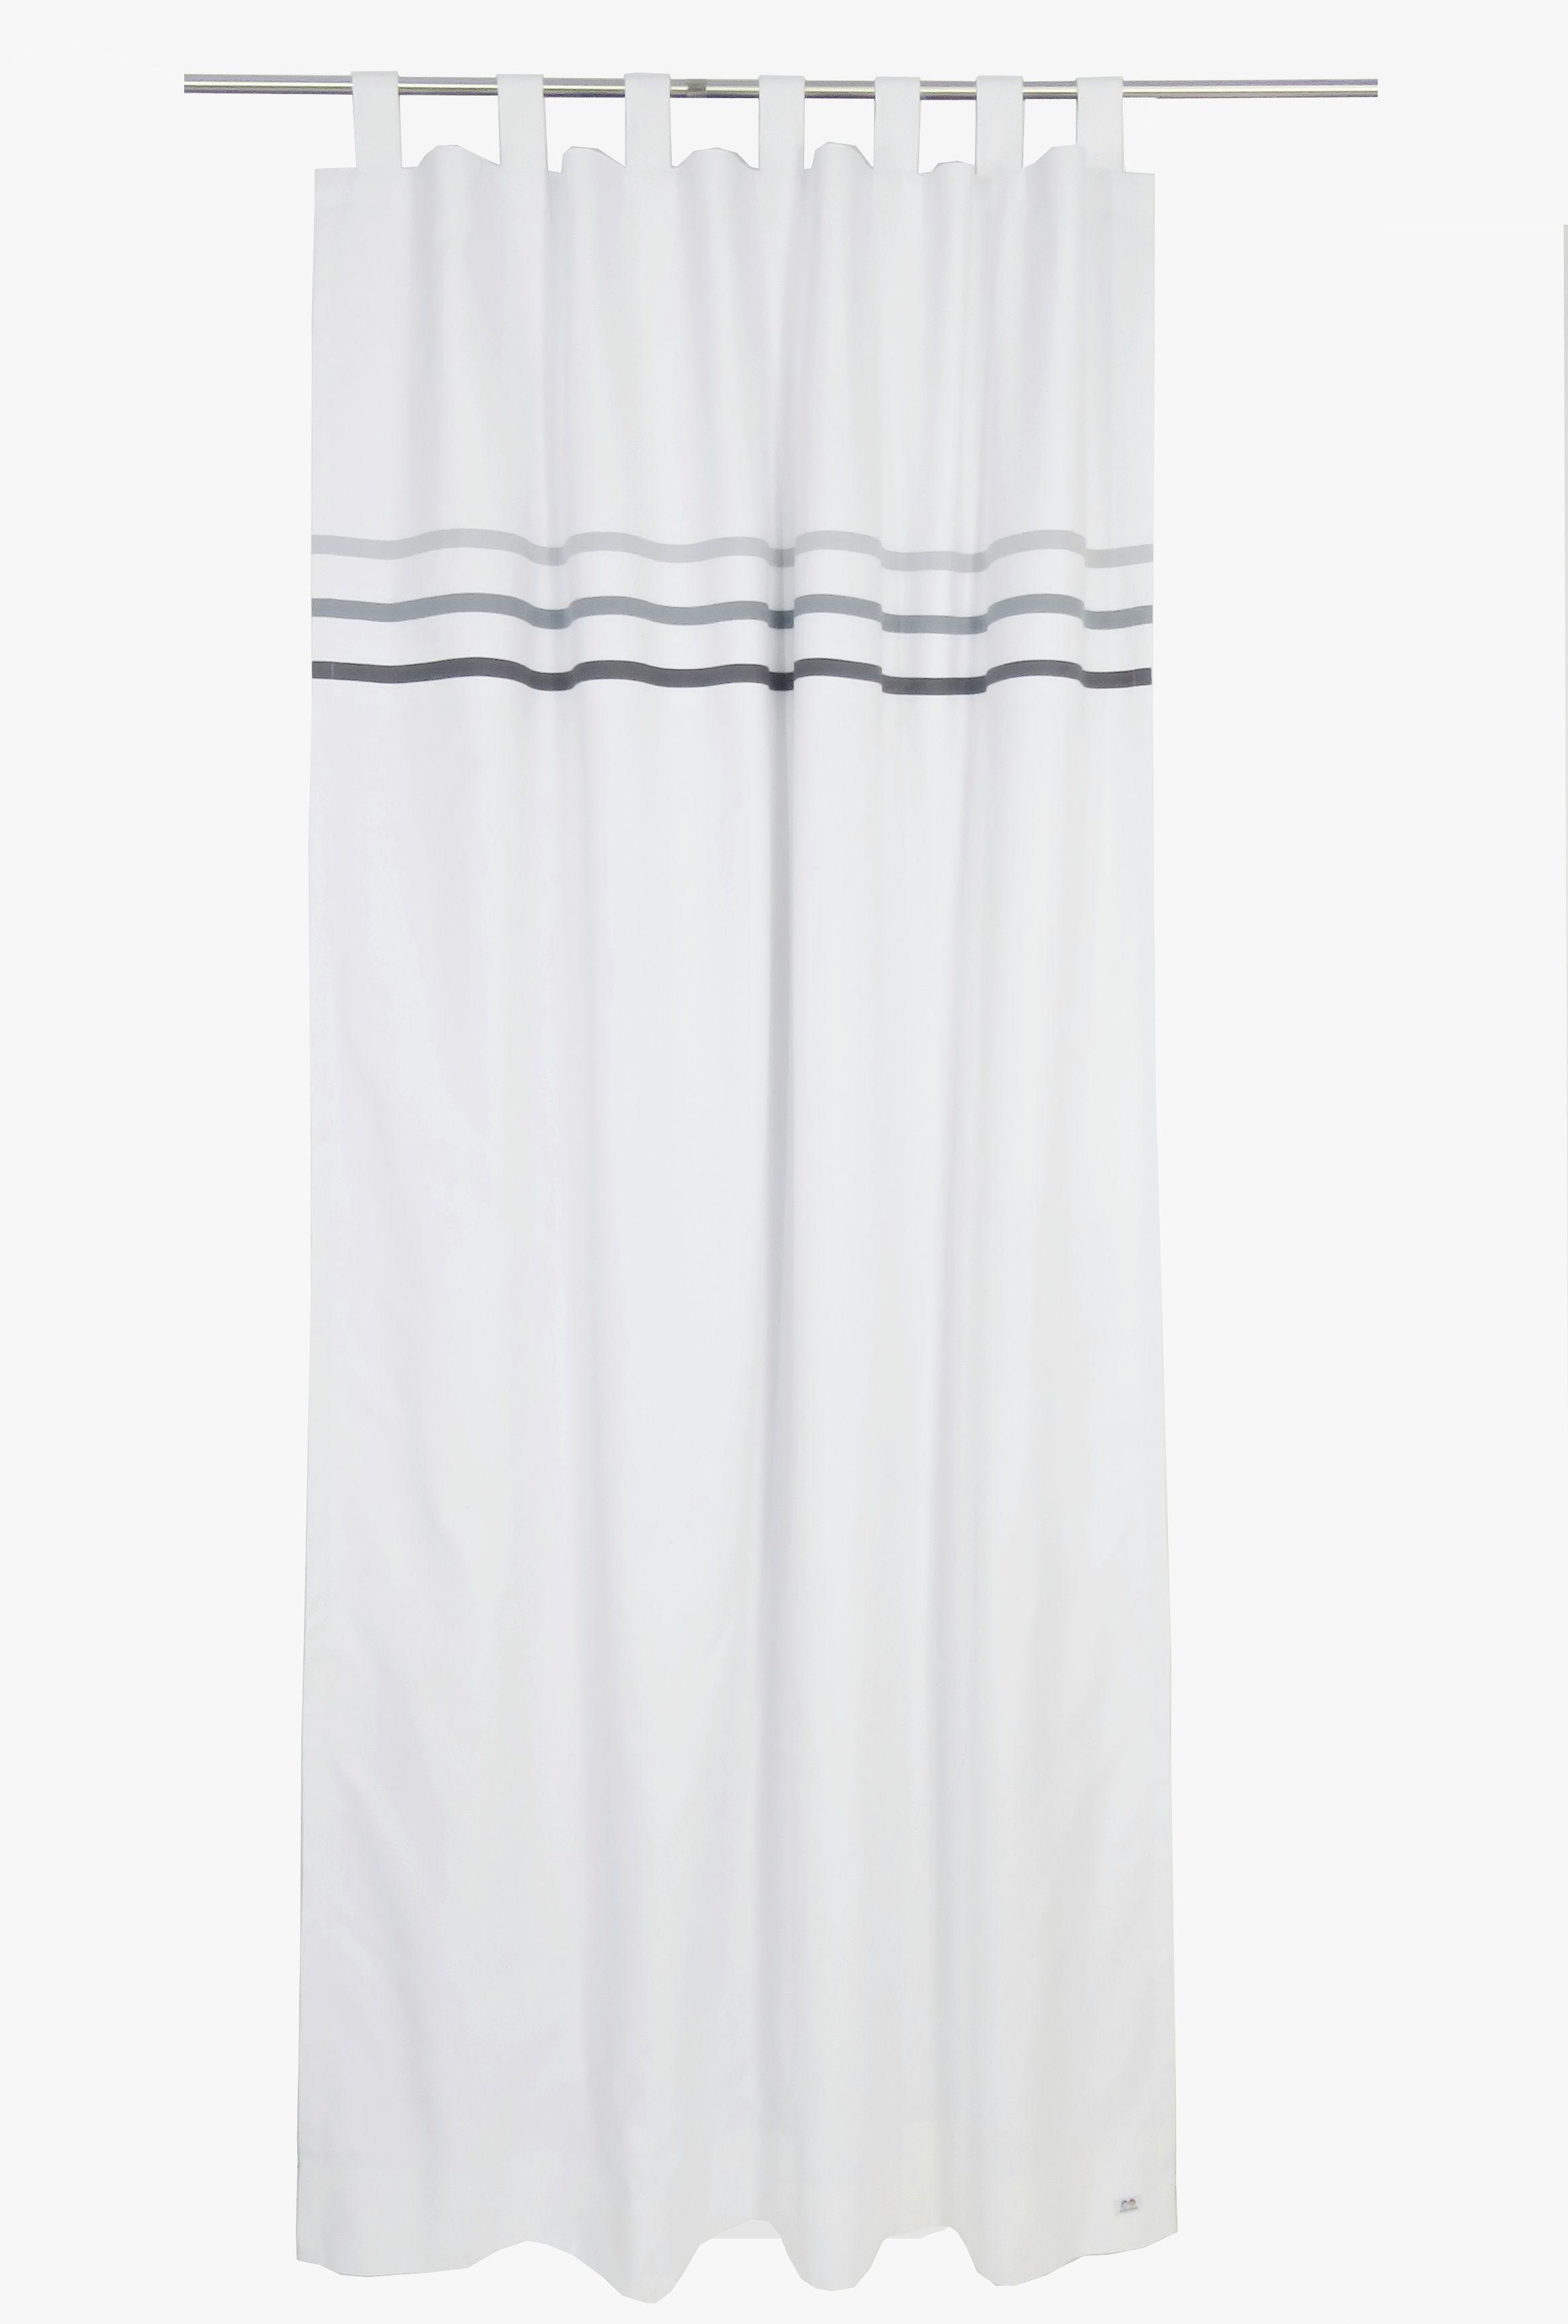 White Gray Minimalist Curtains Modern Bedroom Curtain Panel Etsy Modern Bedroom Design New Bedroom Design Trendy Living Rooms